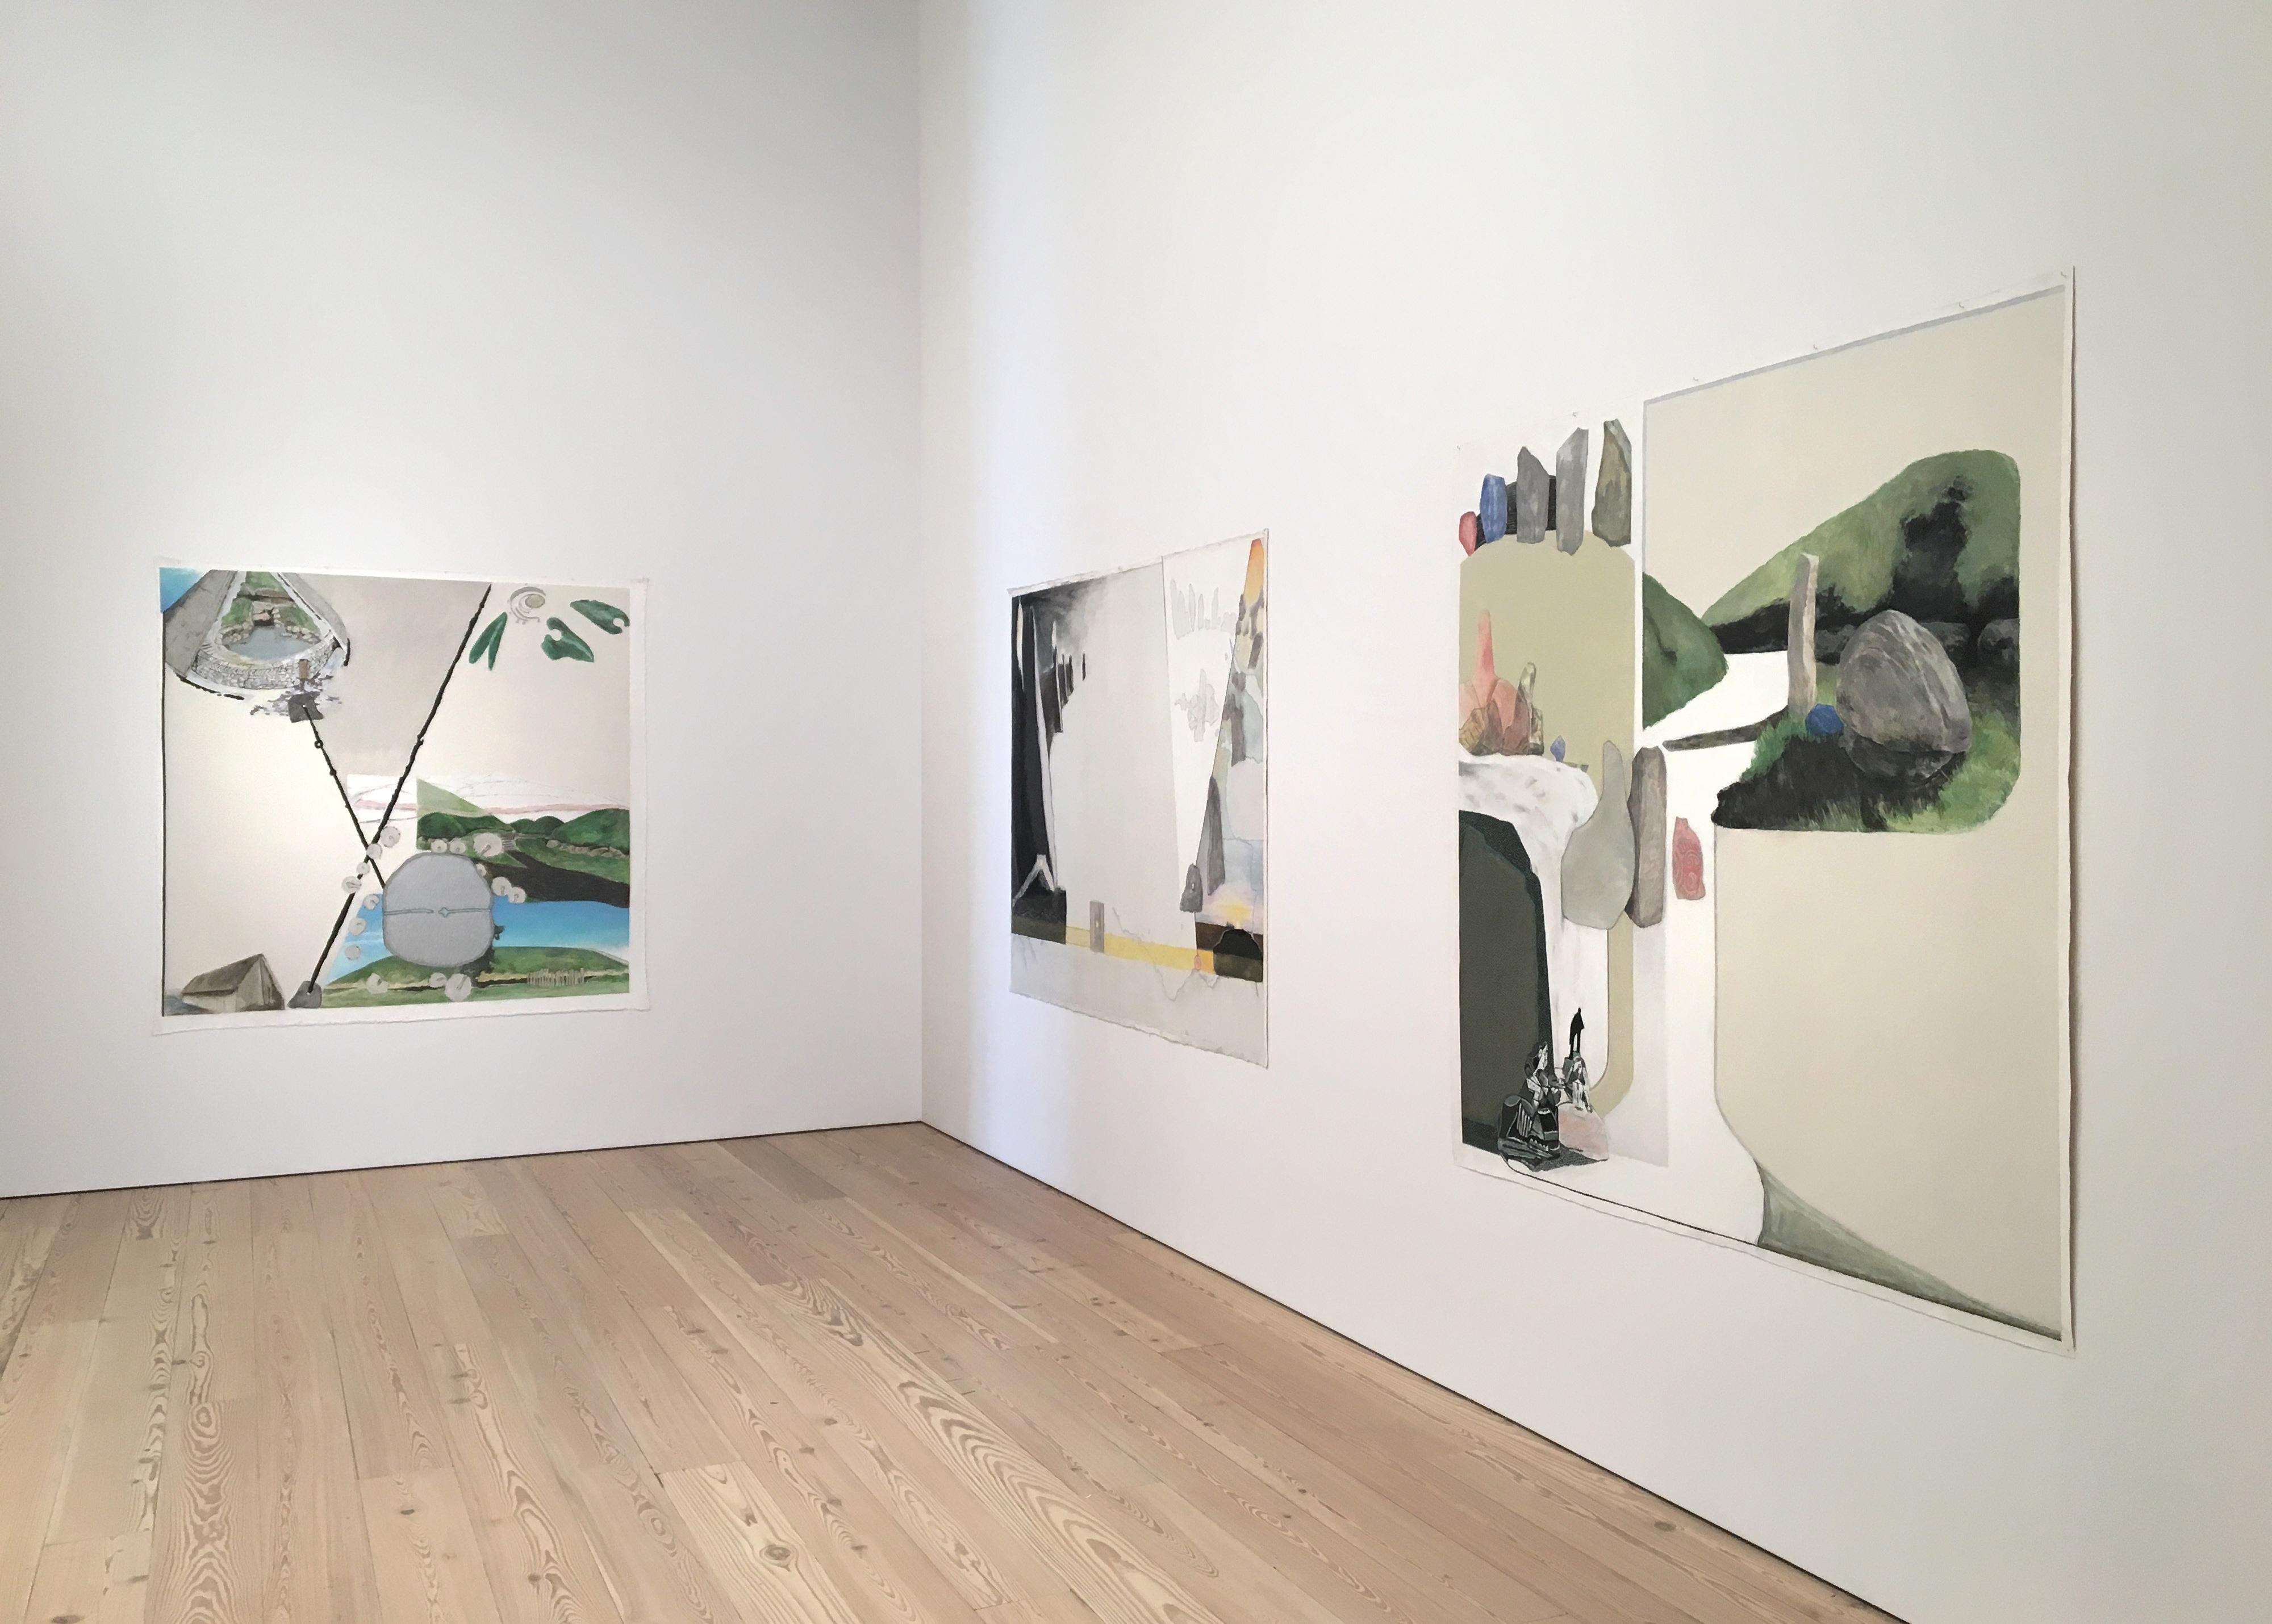 Galerie Barbara Thumm \ Jo Baer – 2017 Whitney Biennial